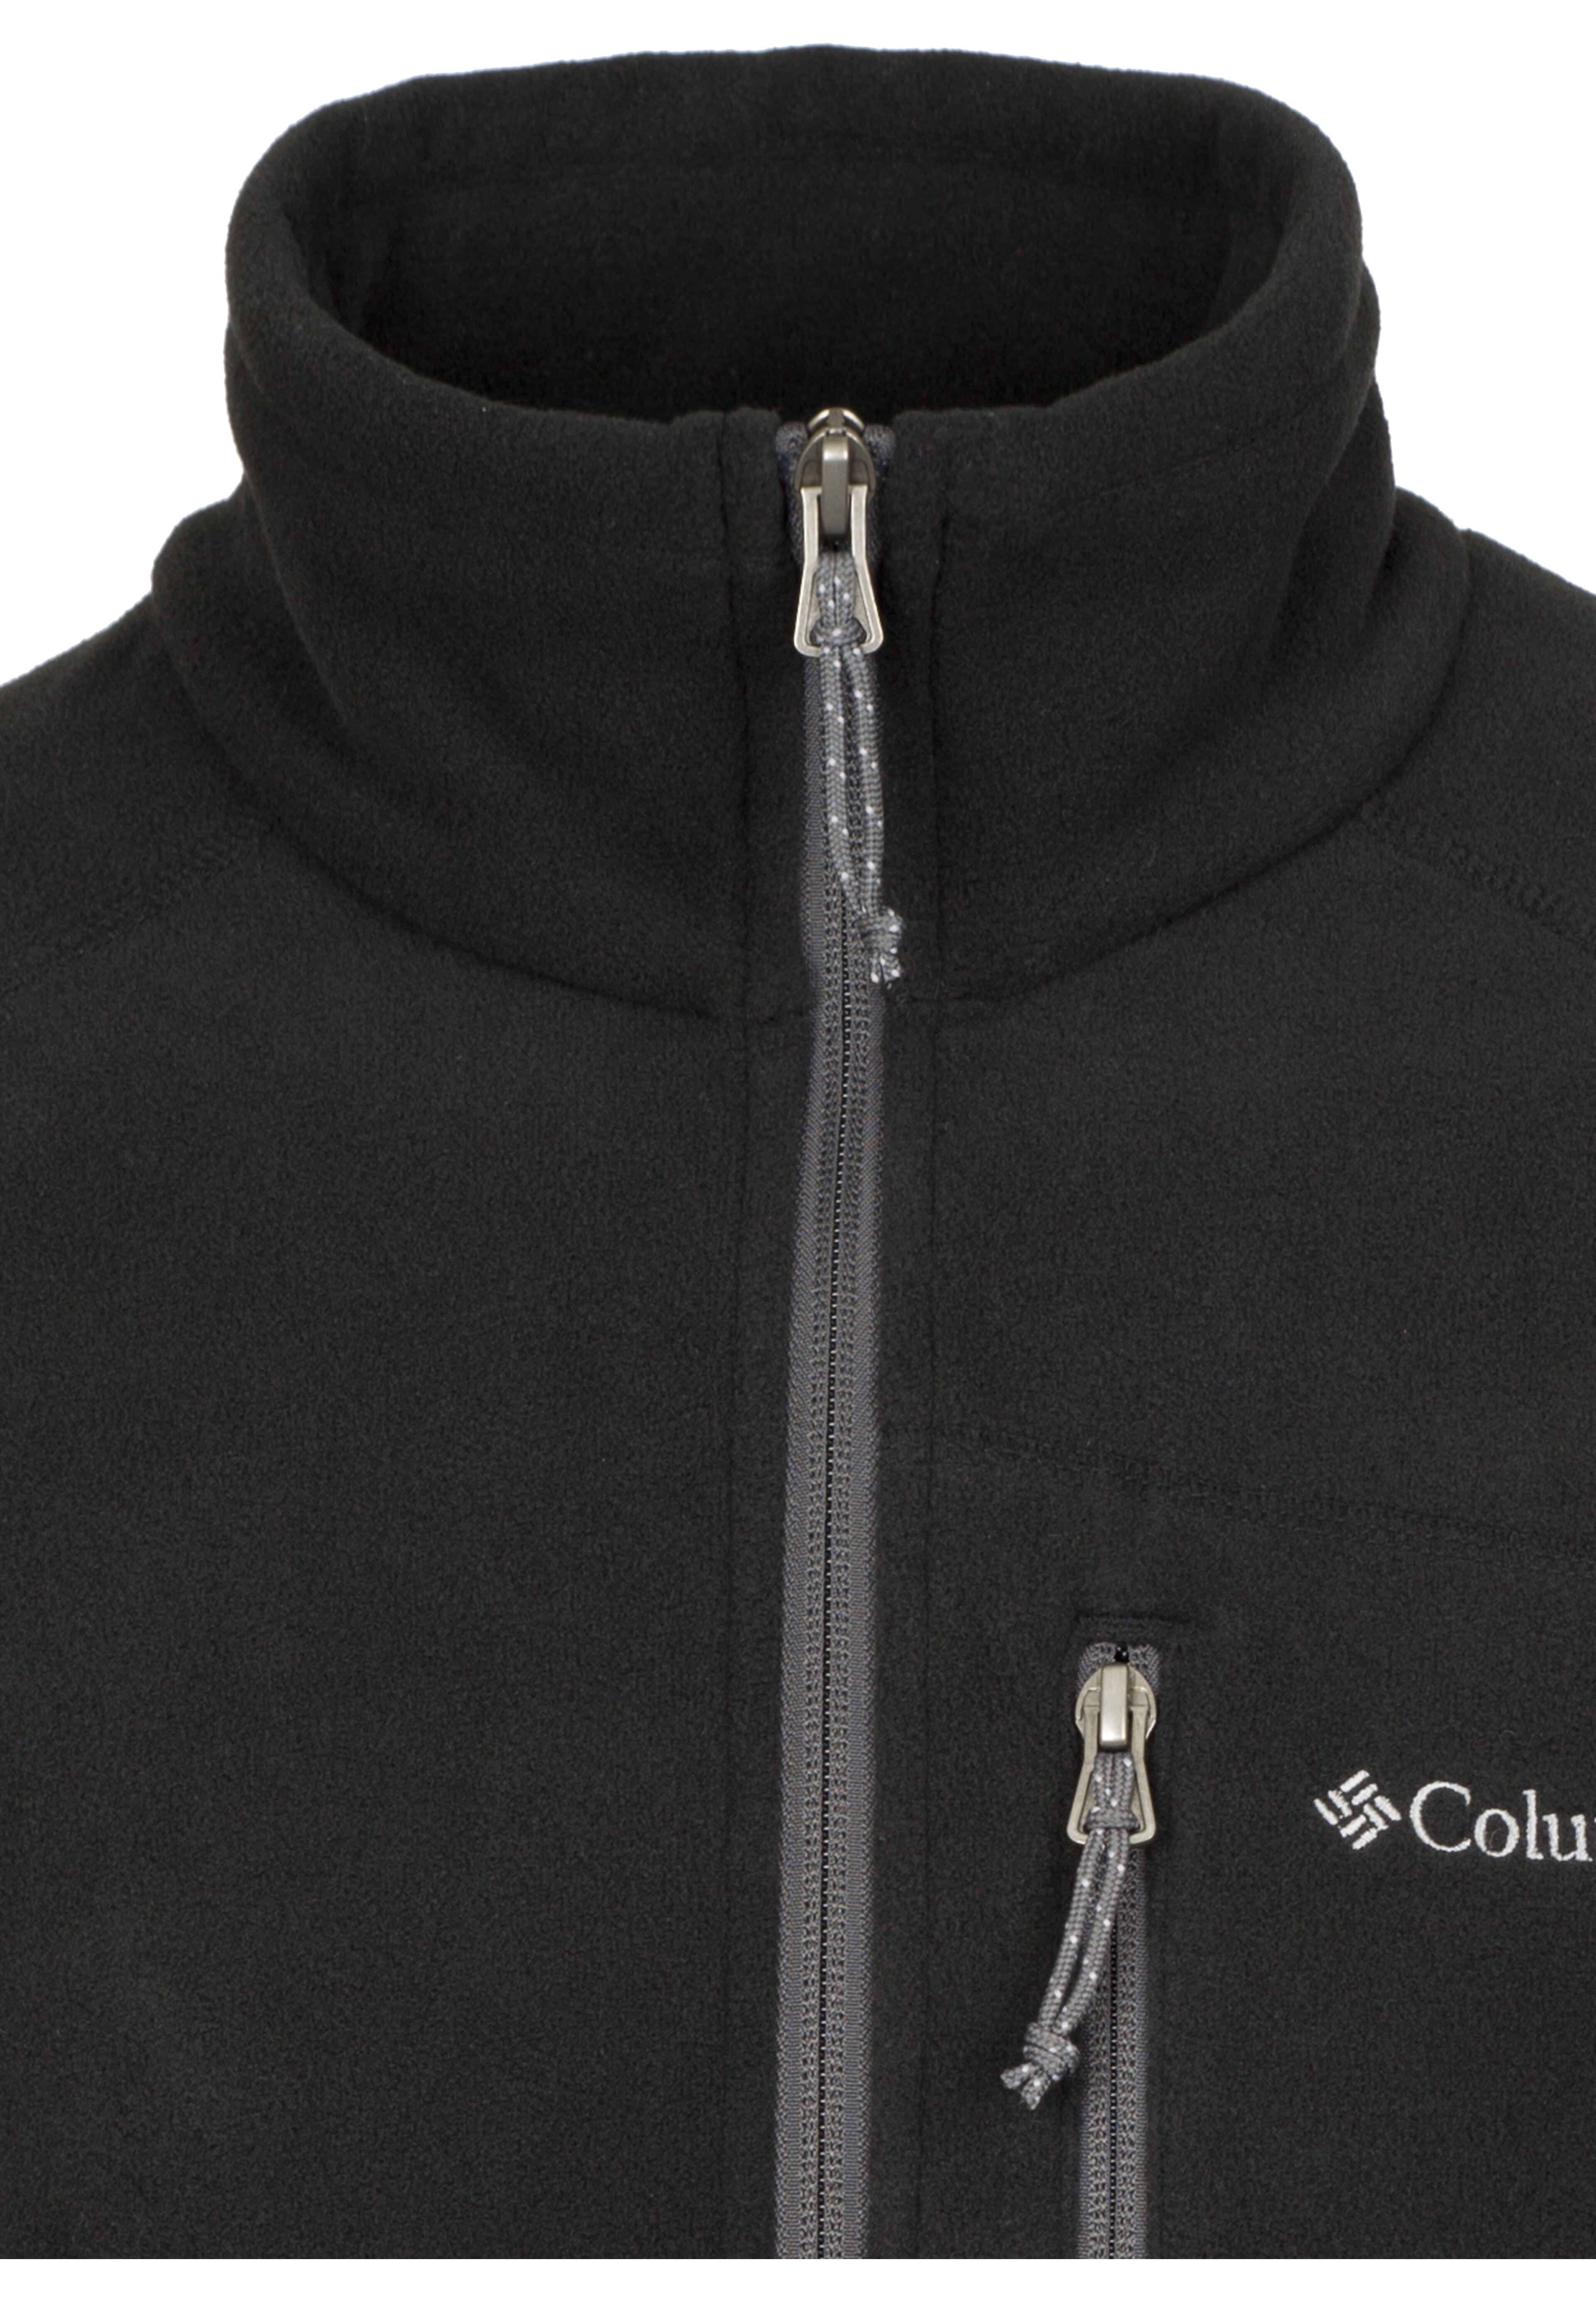 b35852e2 Columbia Fast Trek II Jakke Herrer, black | Find outdoortøj, sko ...